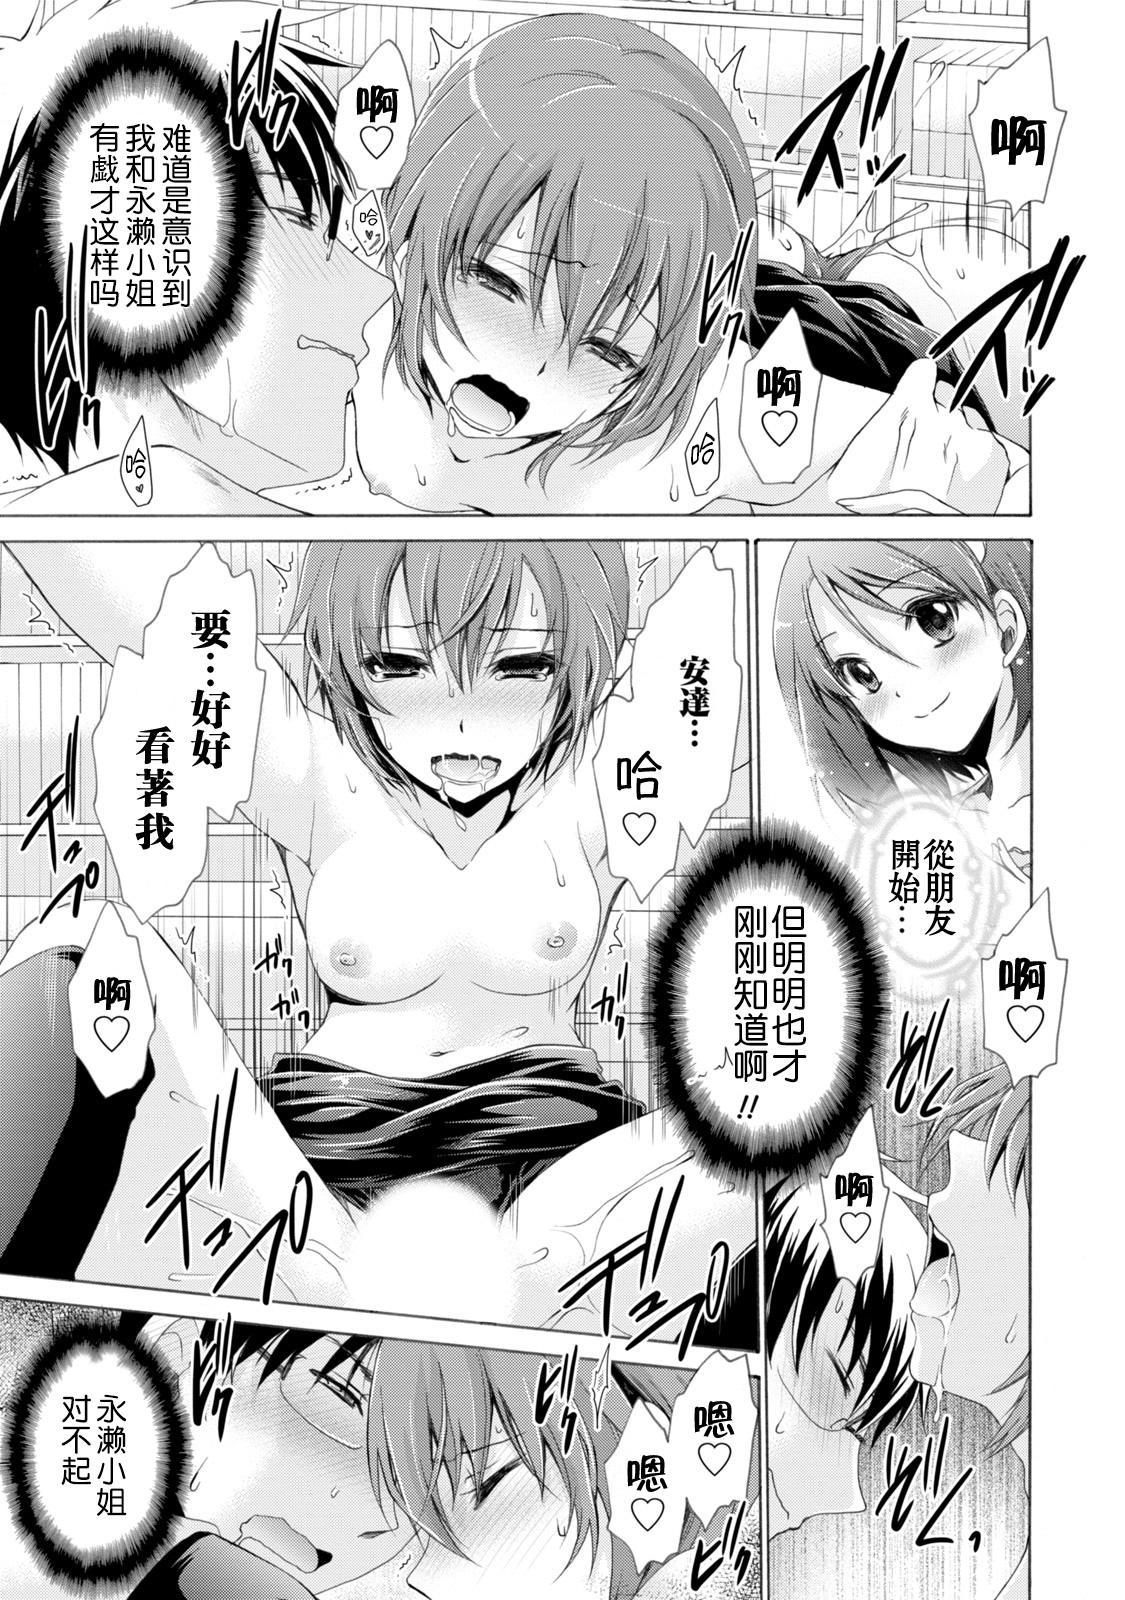 [Shinonome Ryu] Ore to Kanojo to Owaru Sekai - World's end LoveStory 1-5 [Chinese] [爱弹幕汉化组] [Digital] 42